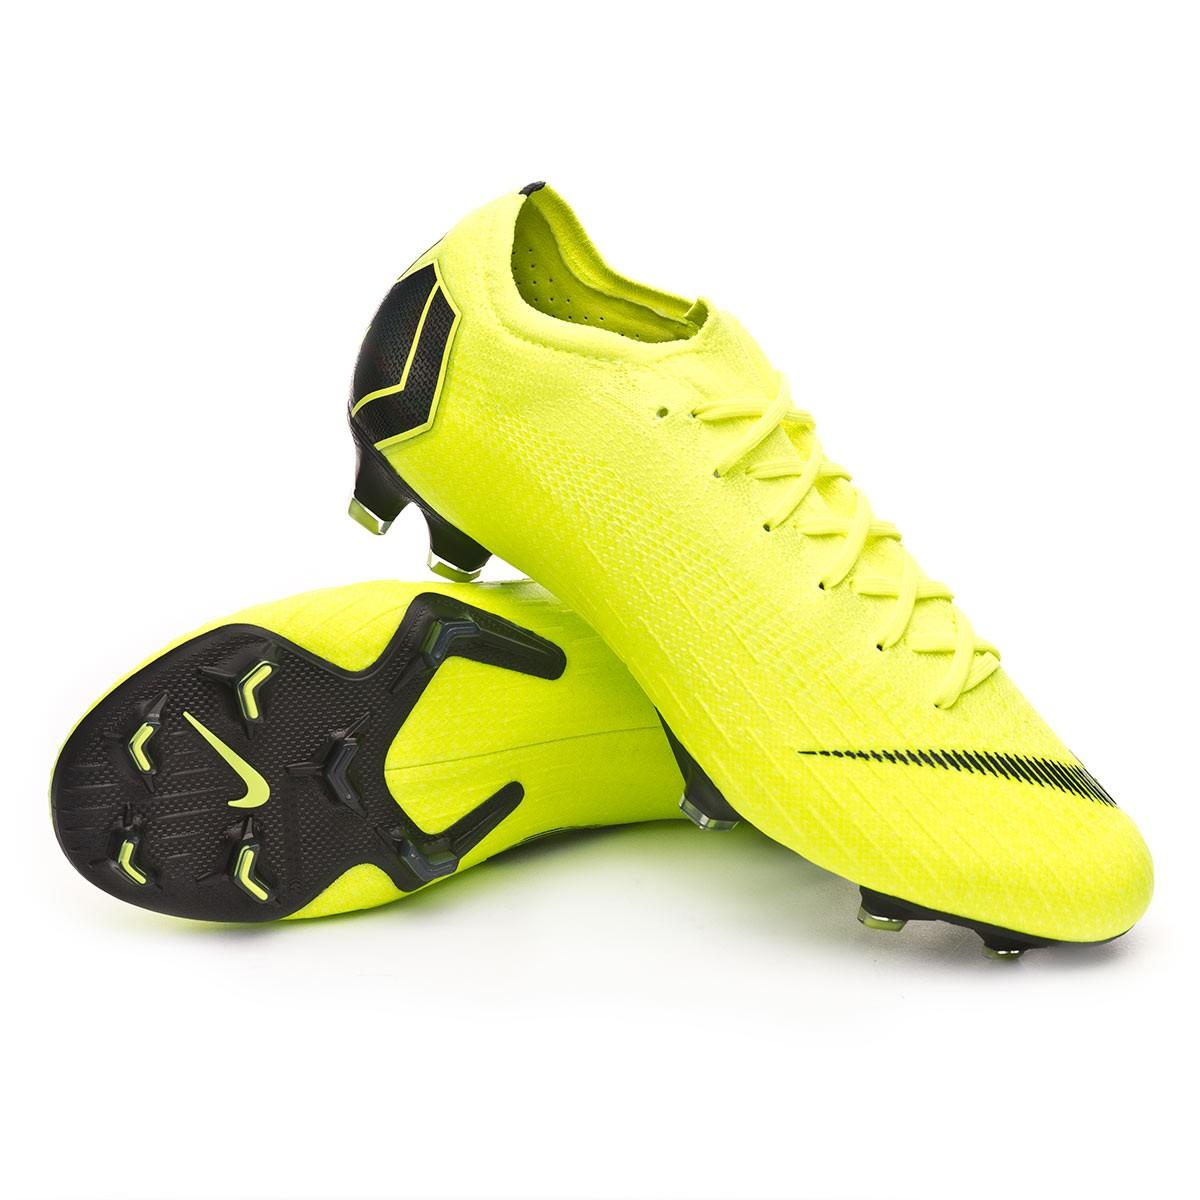 Chuteira Nike Mercurial Vapor Xii Fg